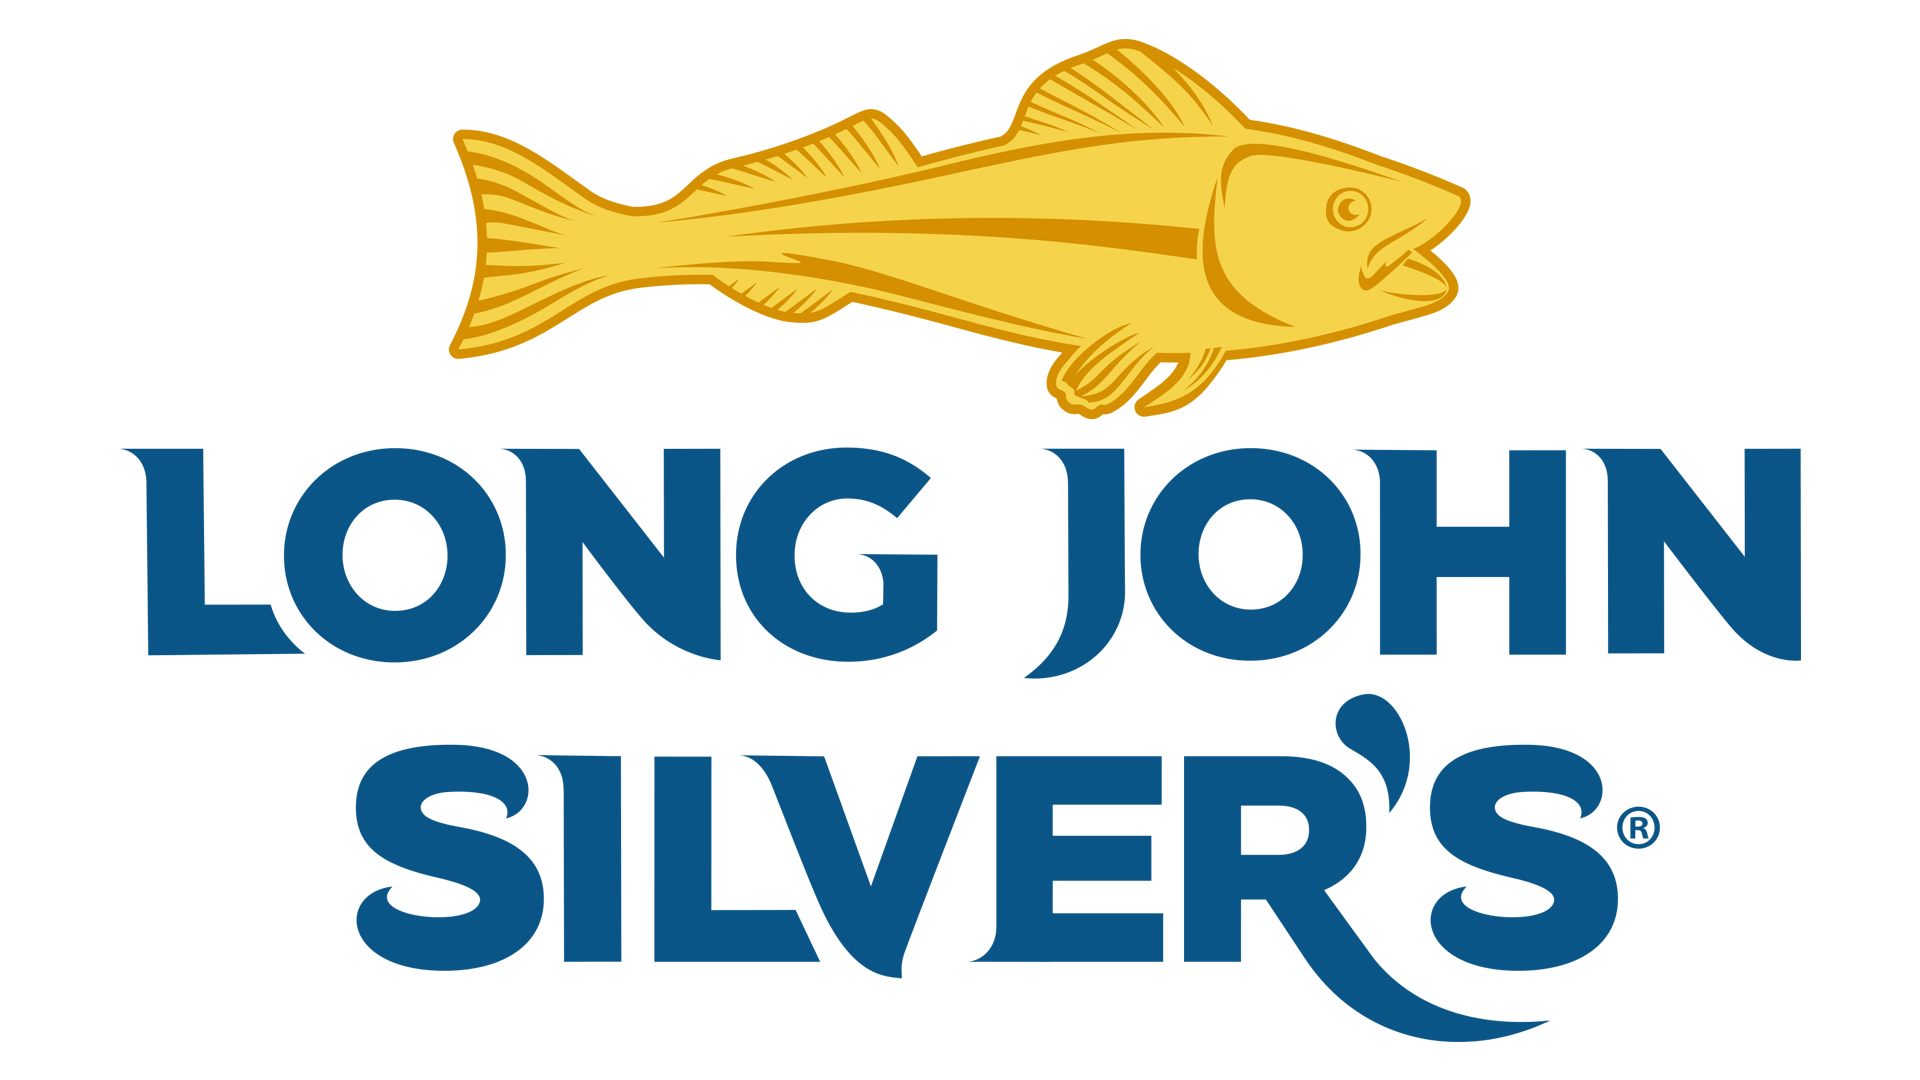 Long_John_Silvers_logo